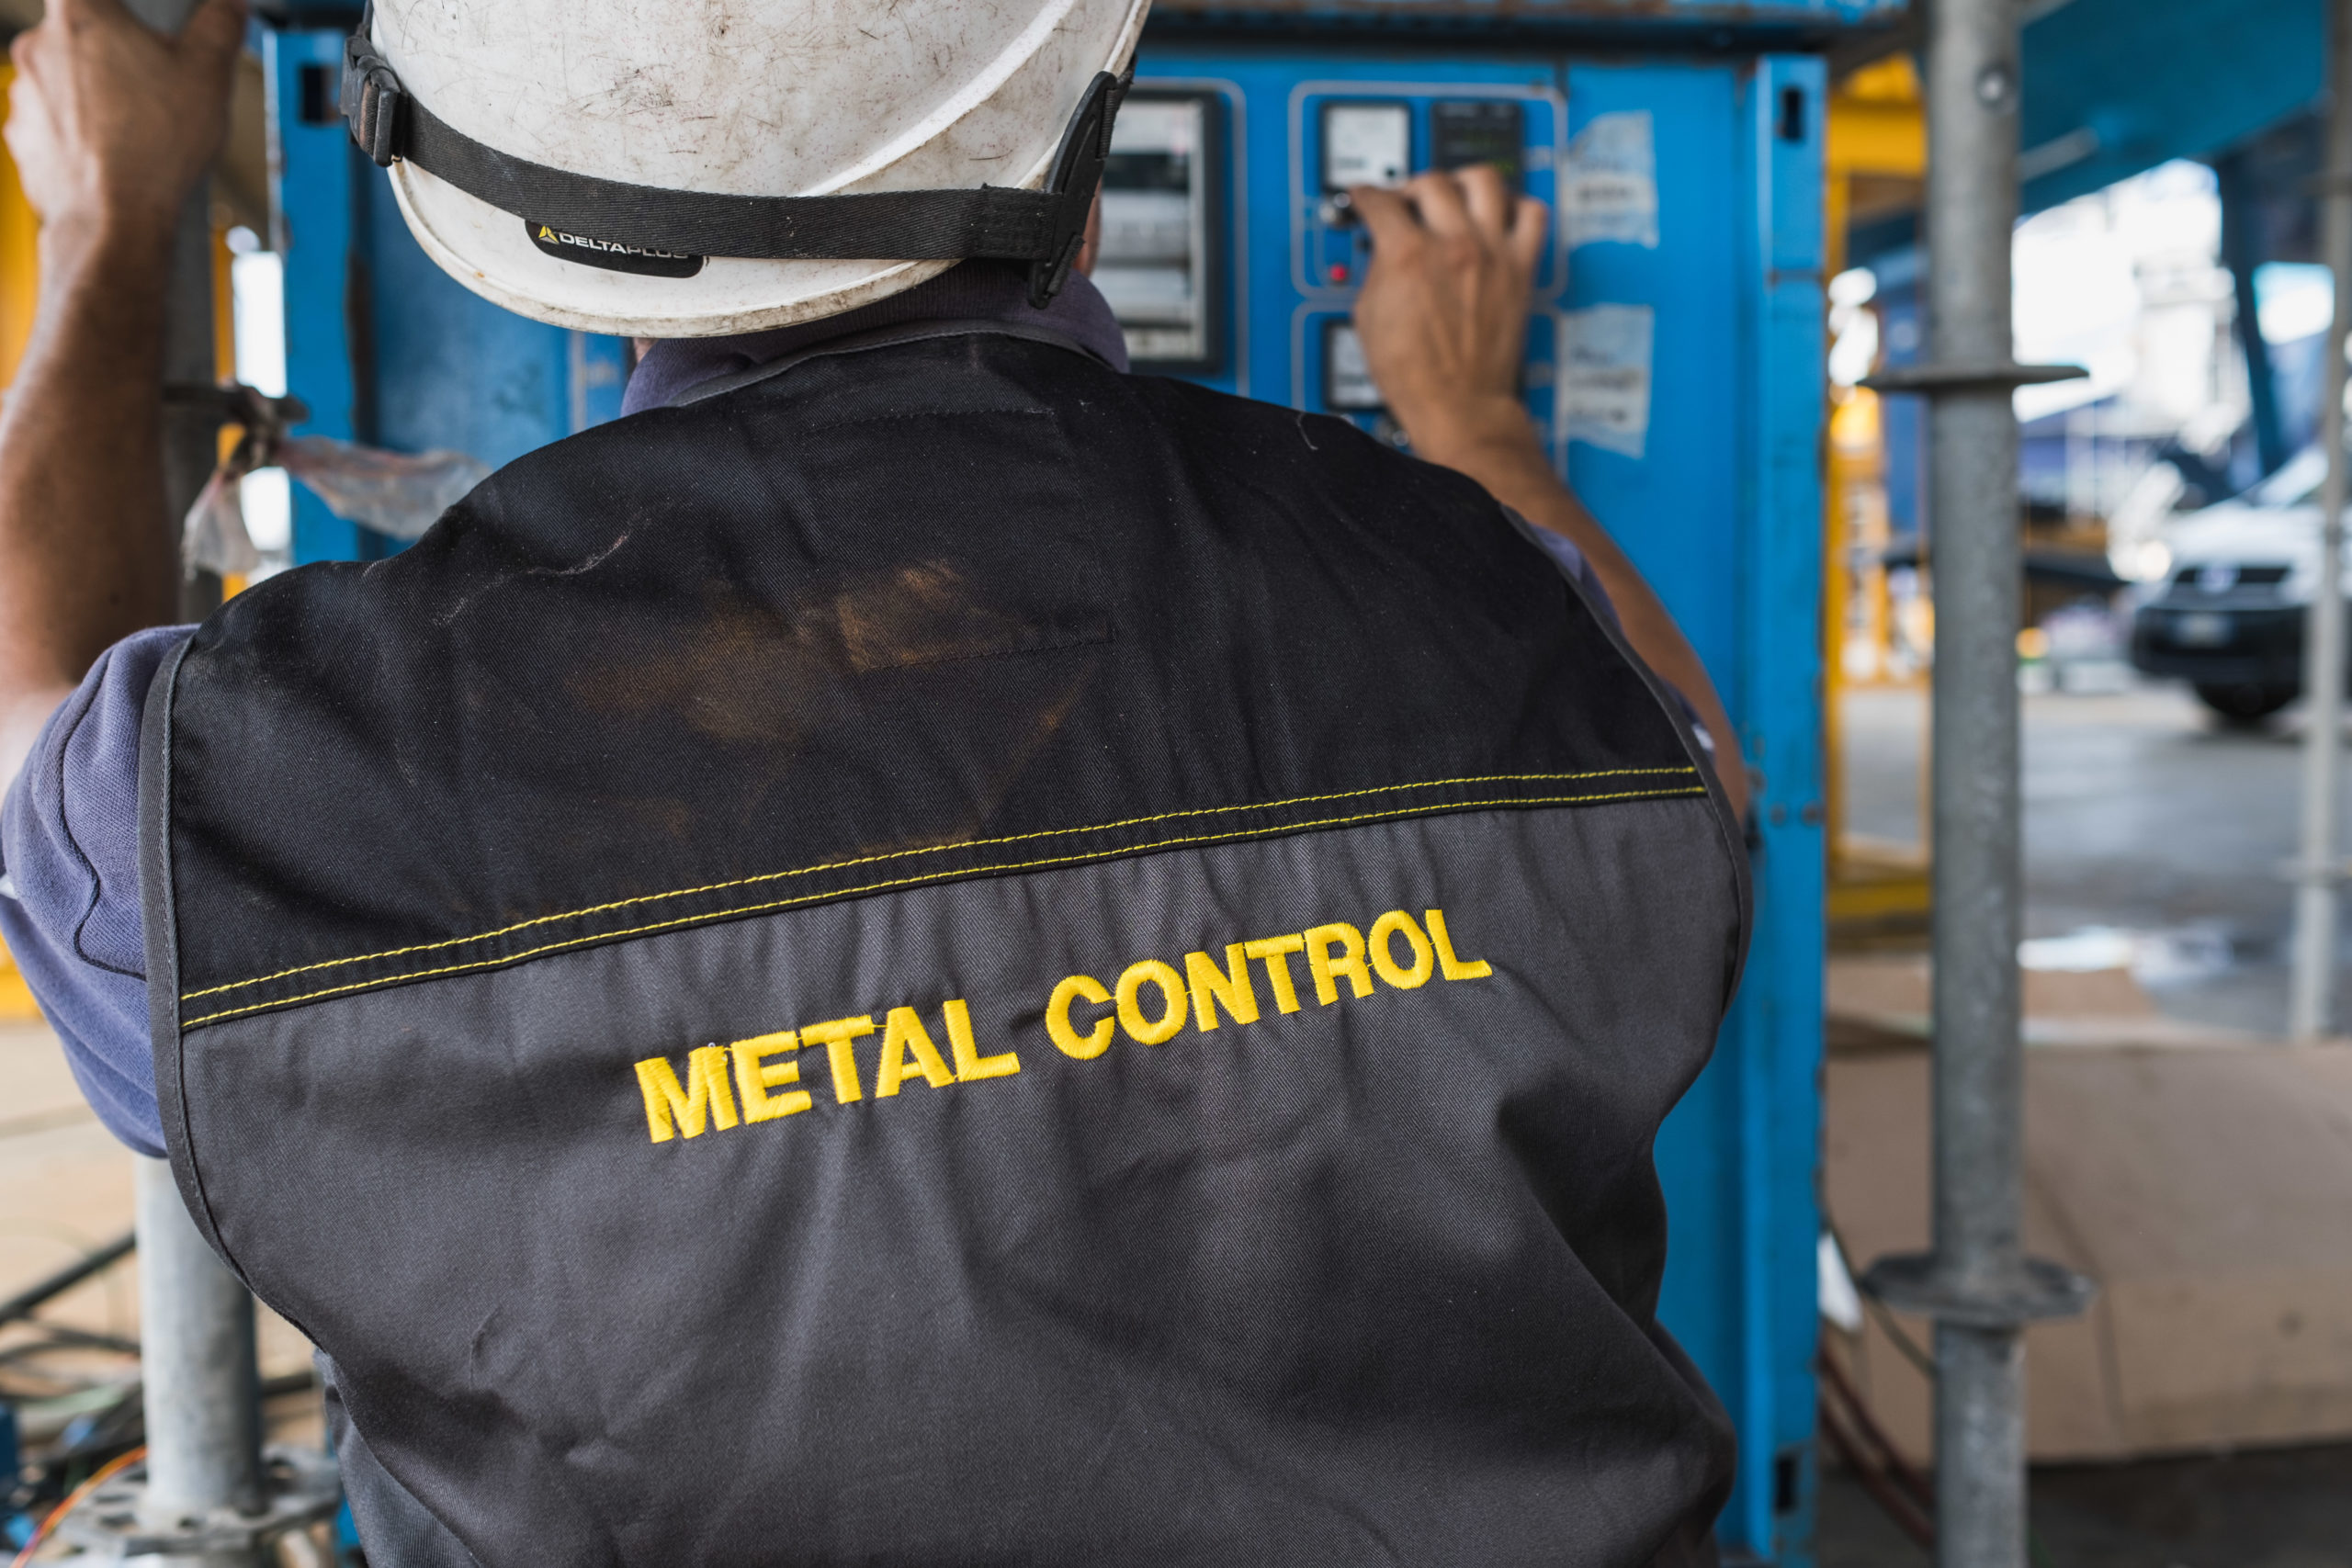 20181009_MetalControl+BGM-55